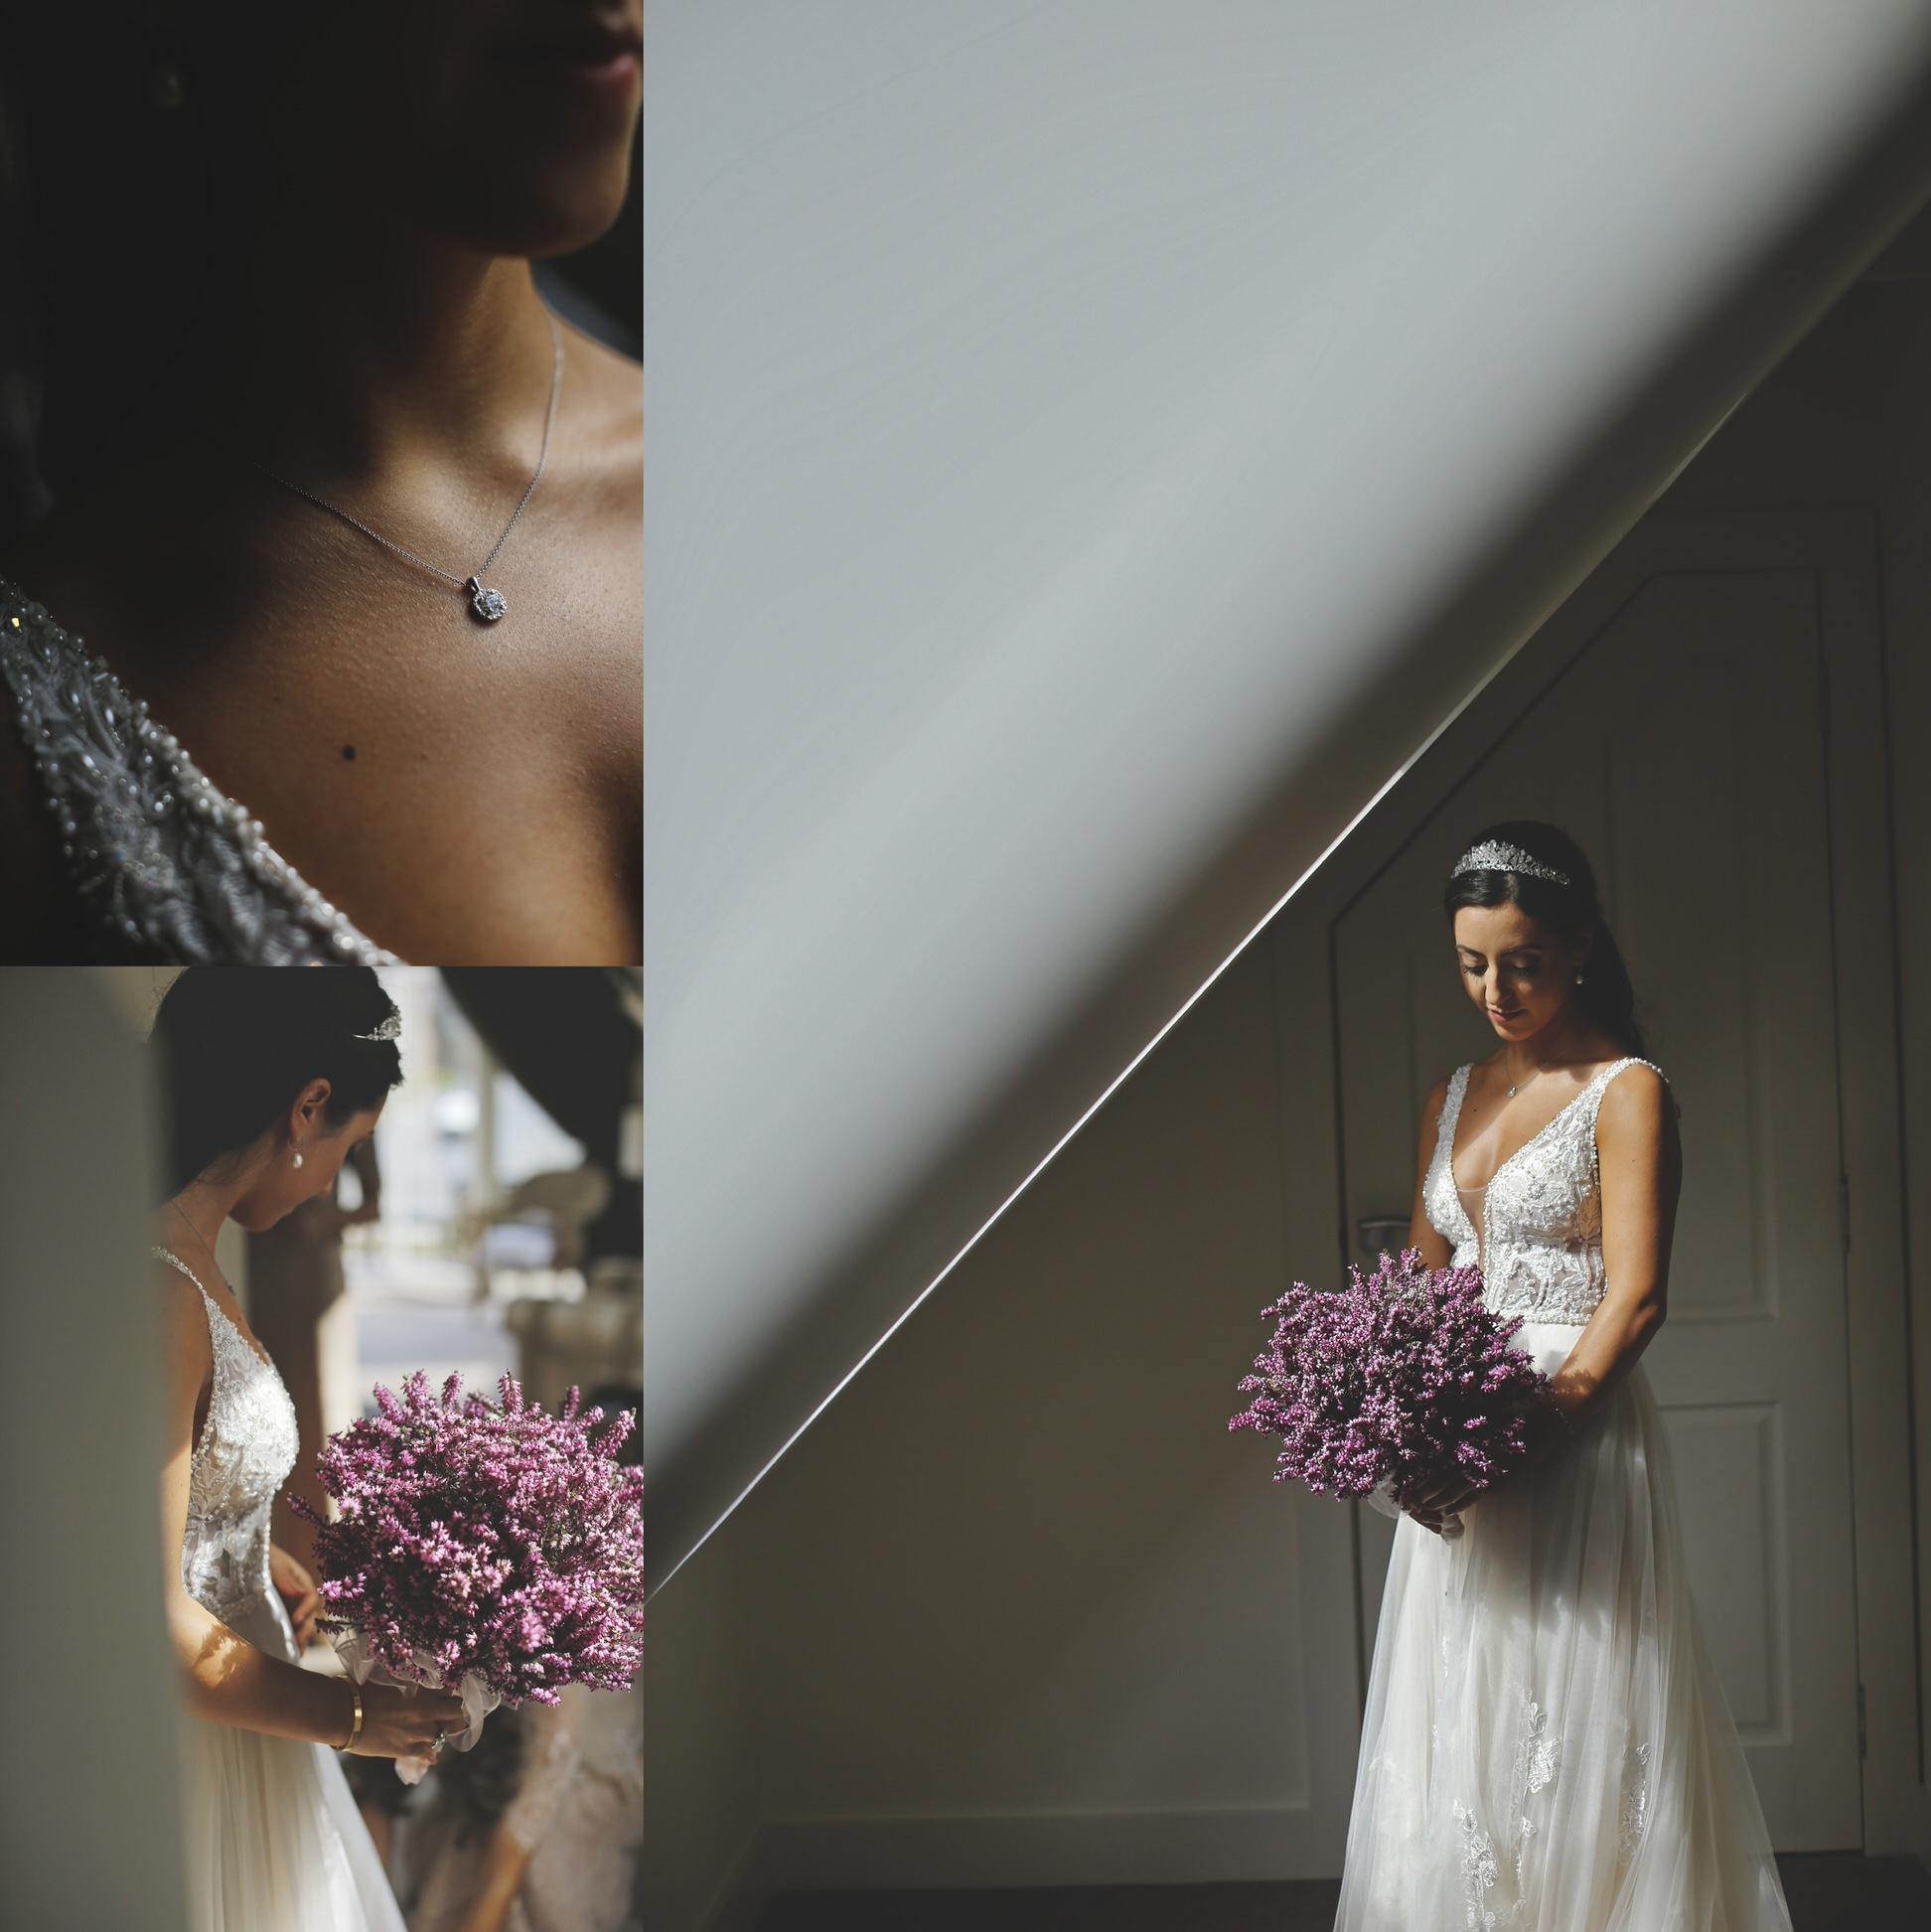 brett-harkness-cotland-wedding-photographer-highland-wedding_0009.jpg